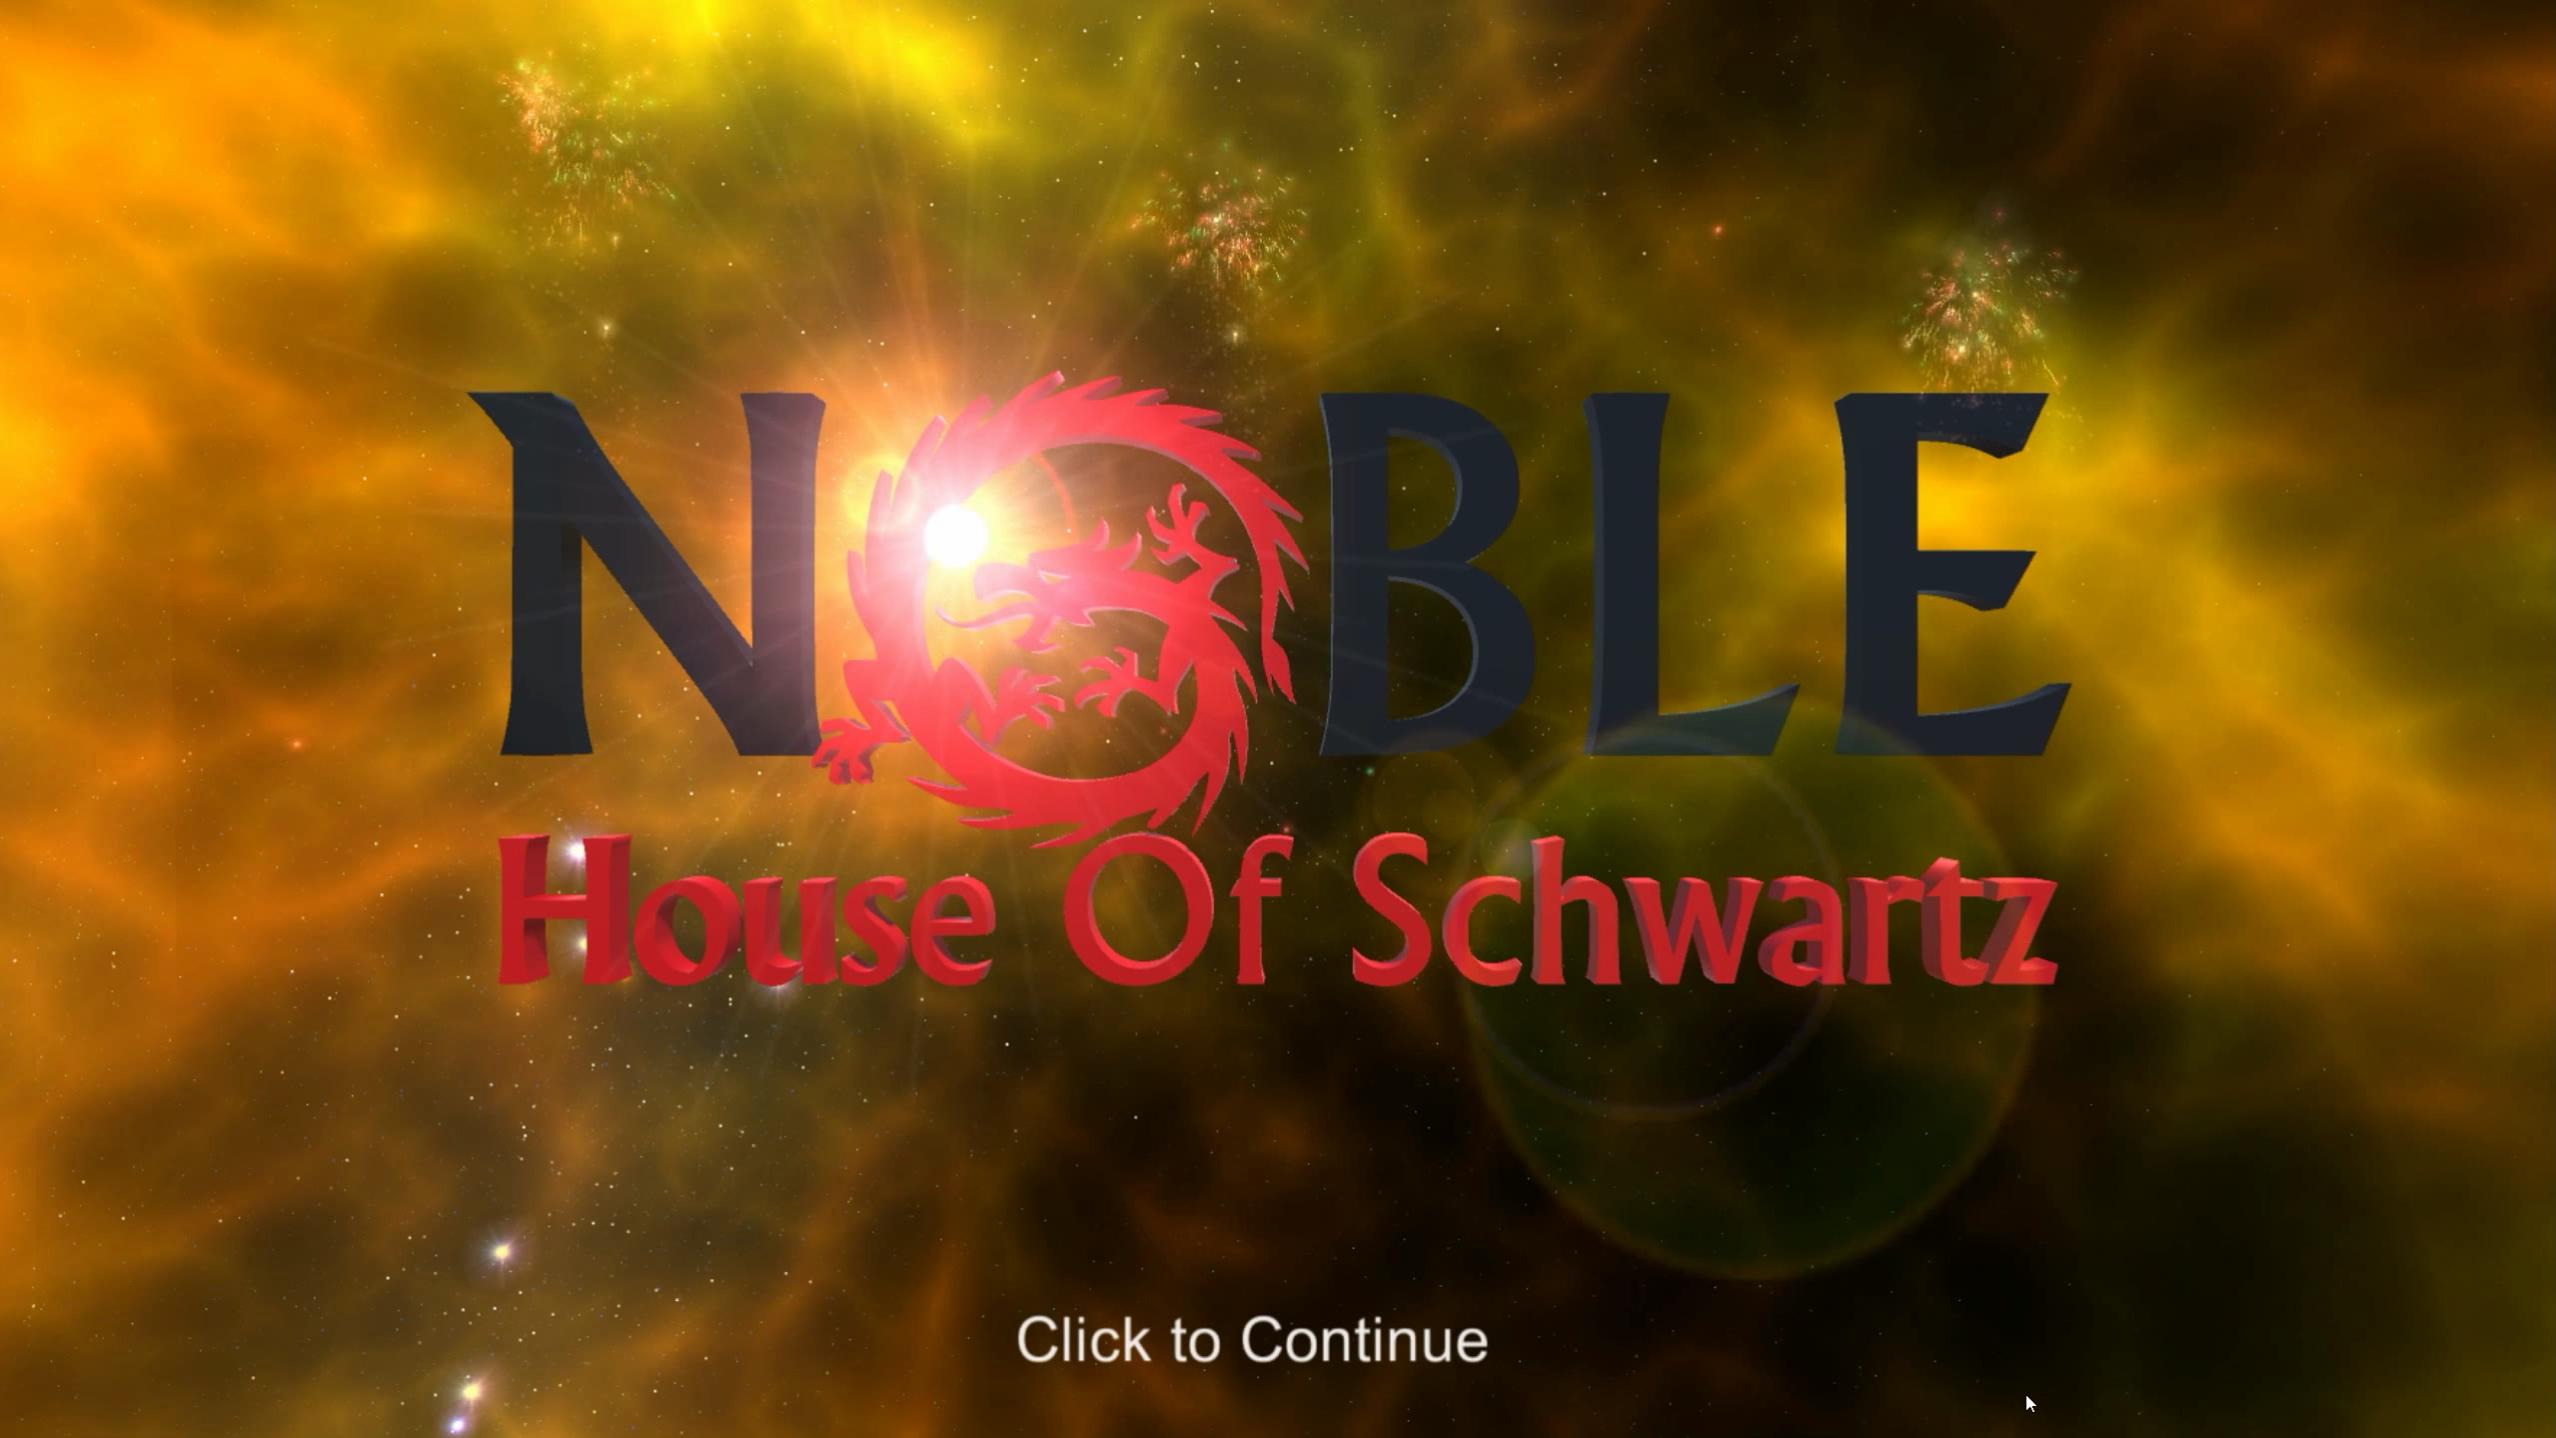 Noble House of Schwartz